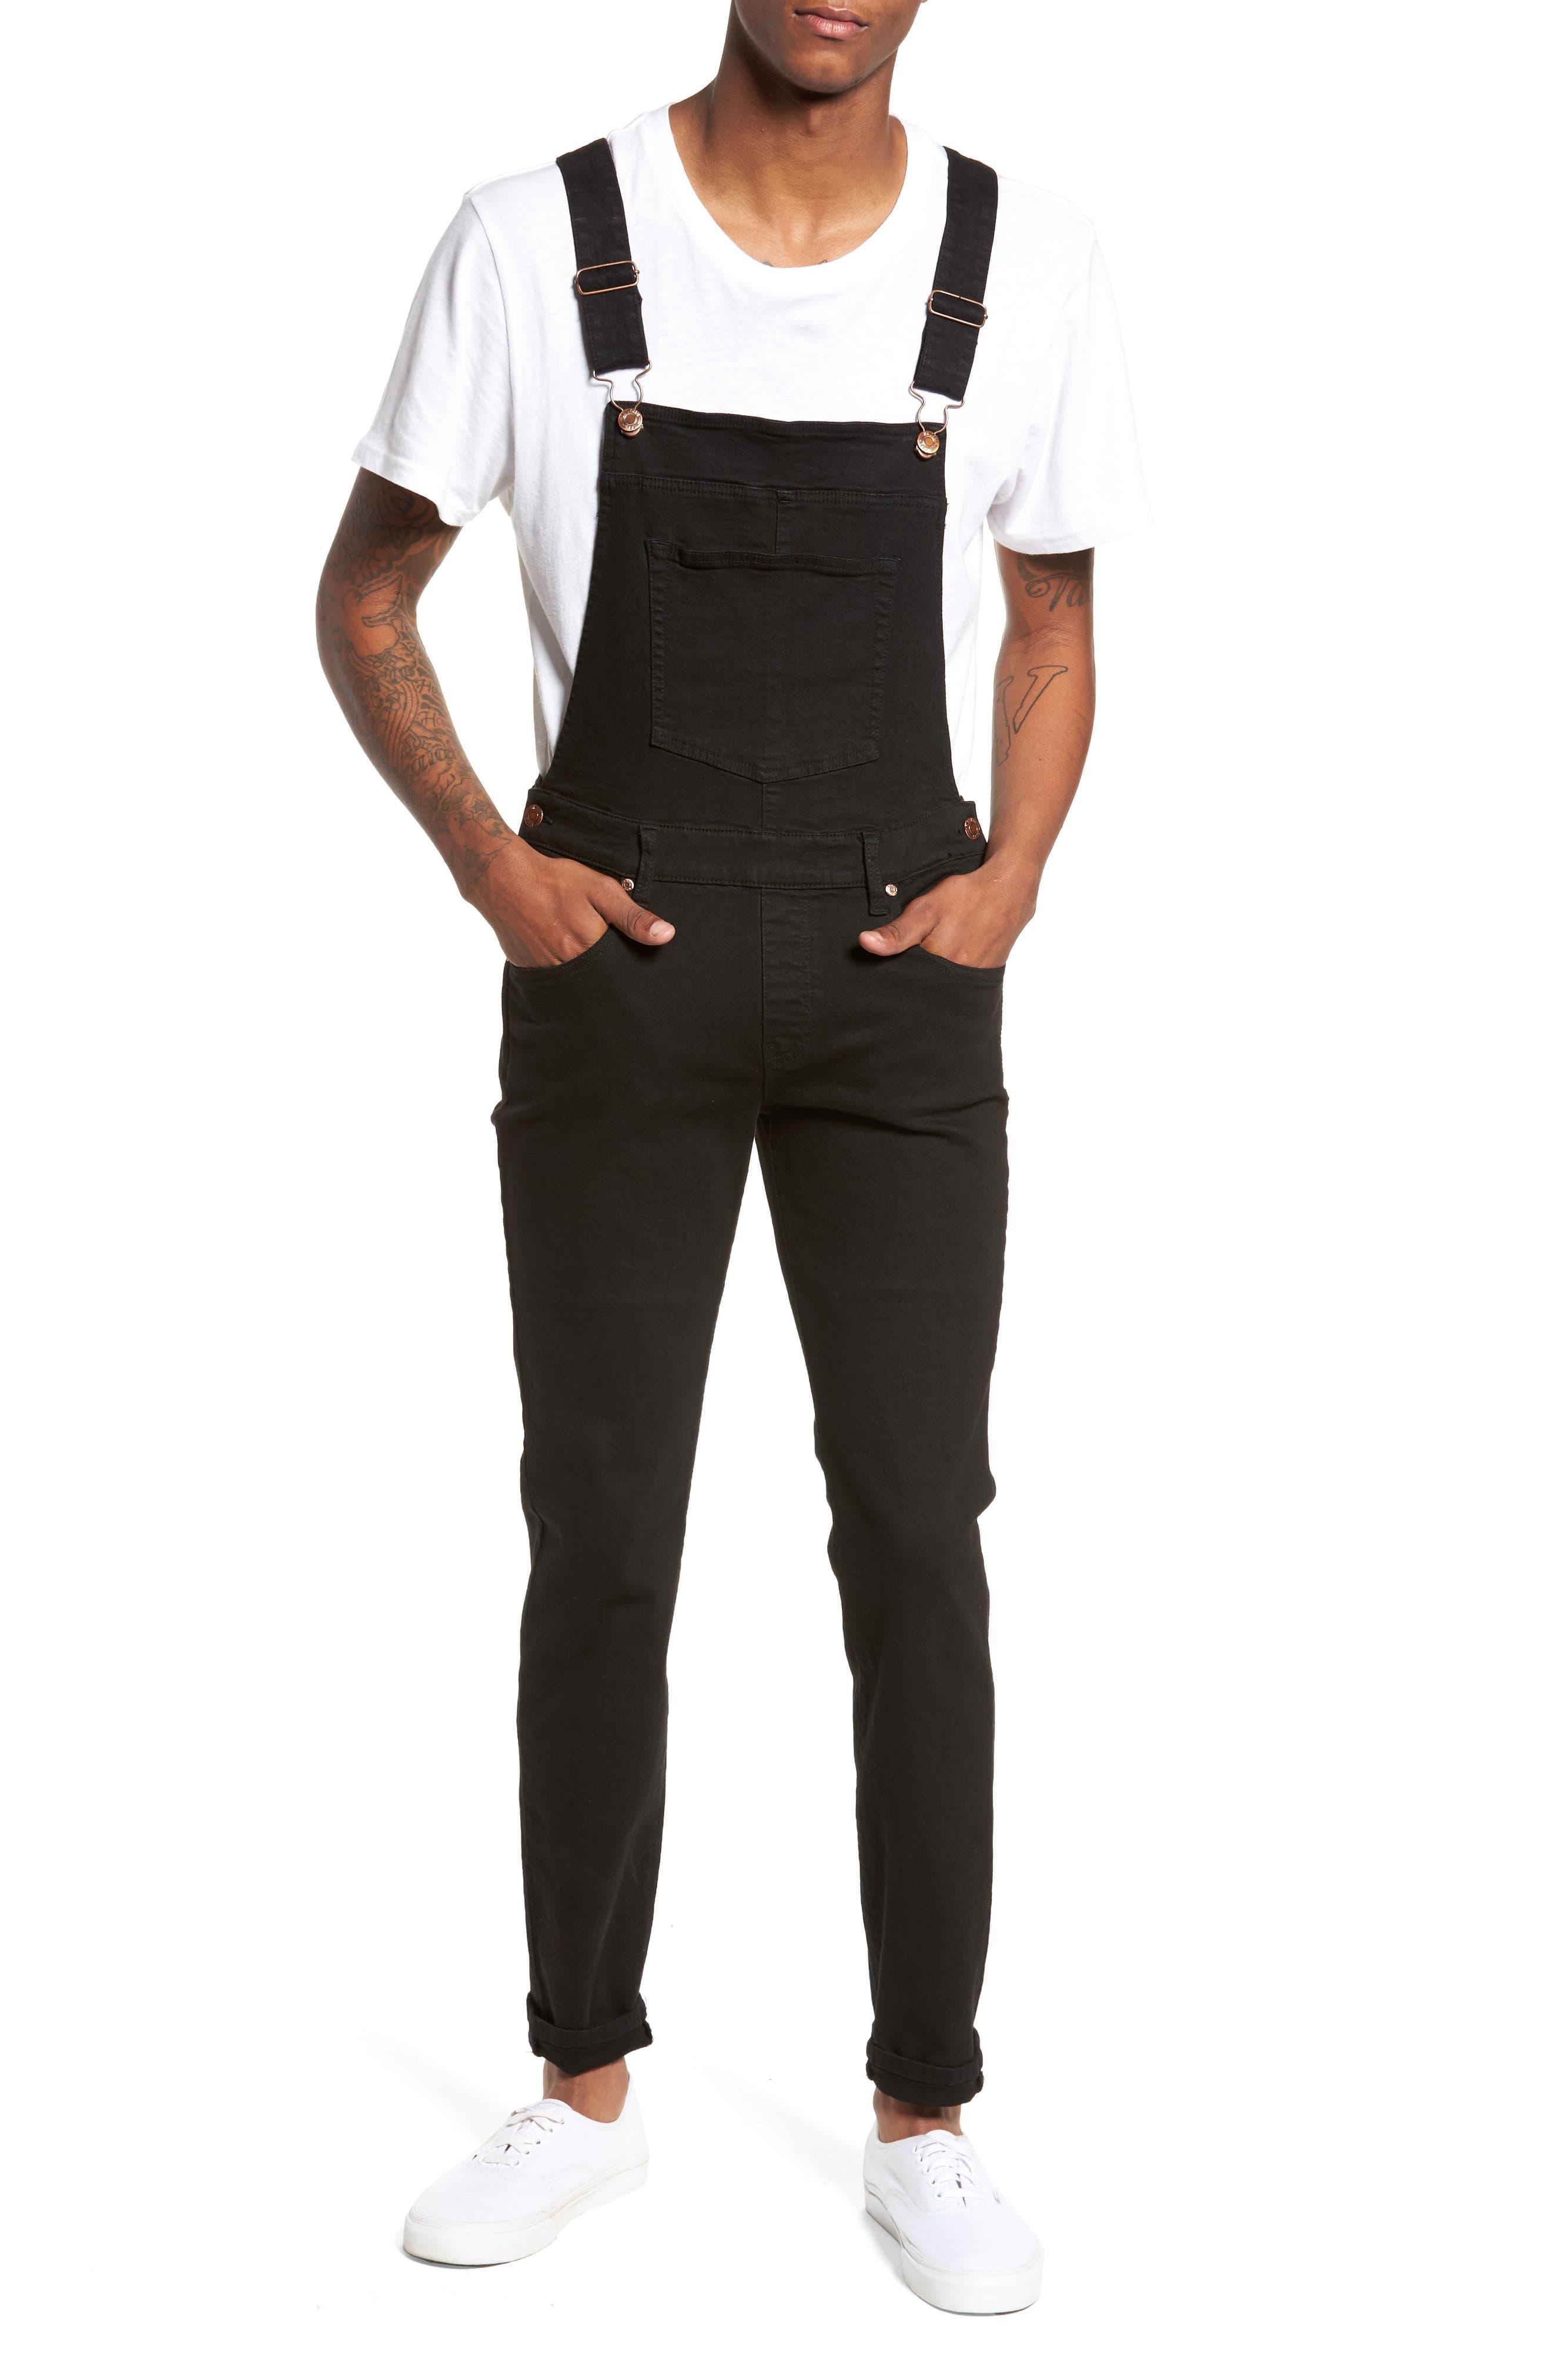 Alternate Image 1 Selected - Dr. Denim Supply Co. Ira Skinny Fit Overalls